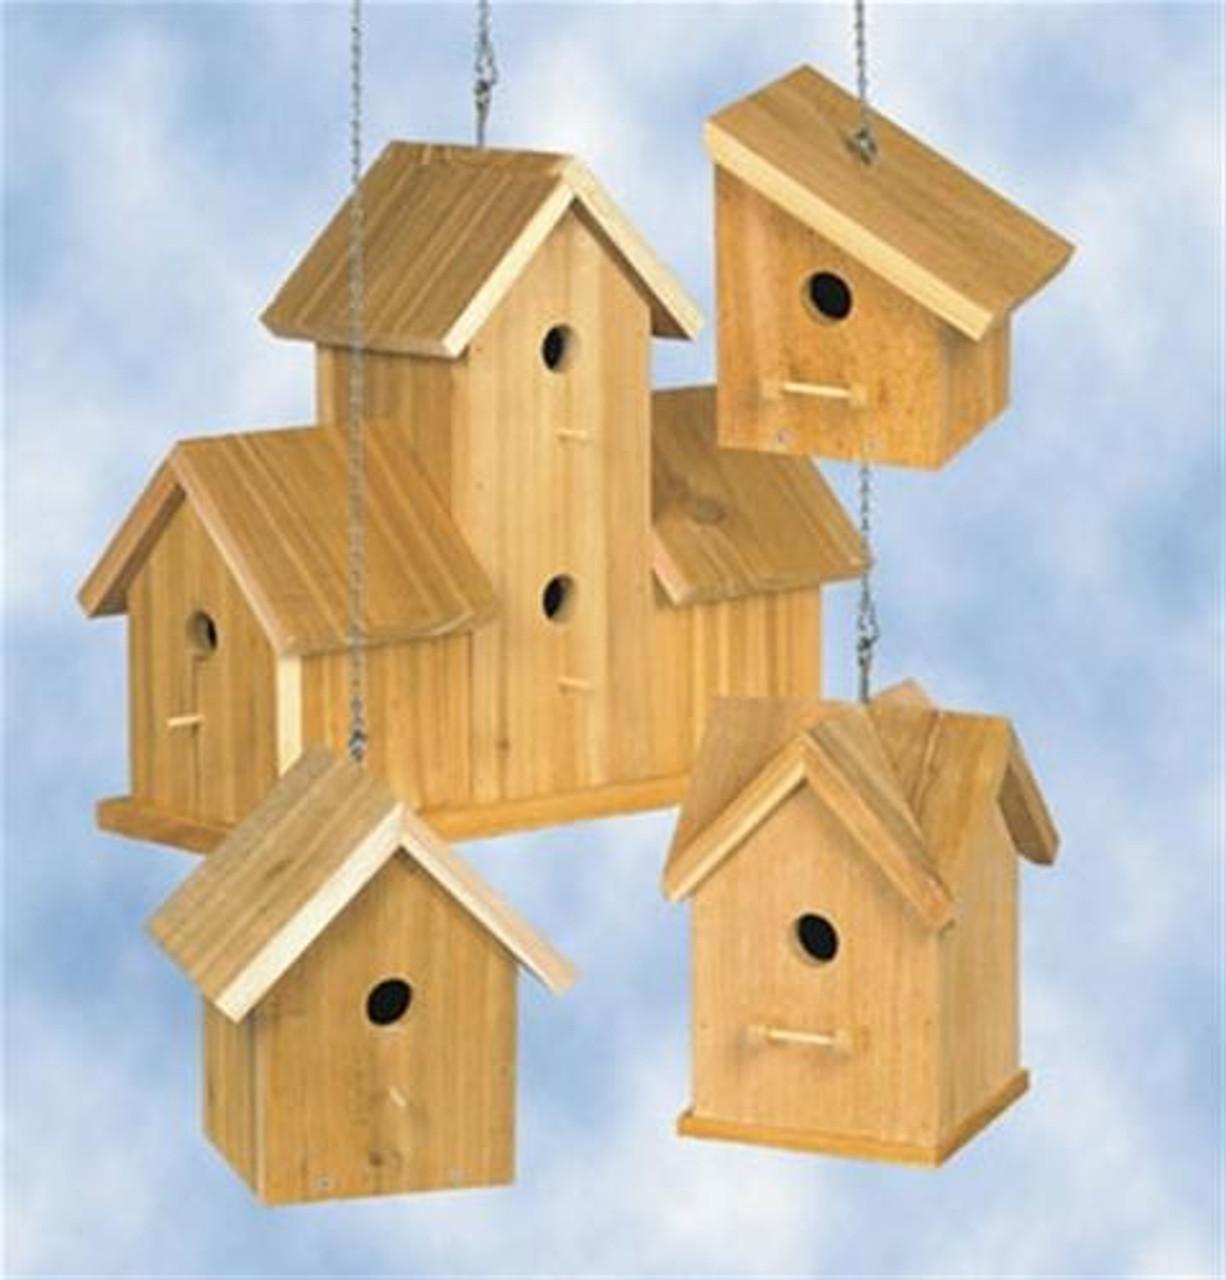 Winfield Collection Cedar Birdhouses #3 Plan